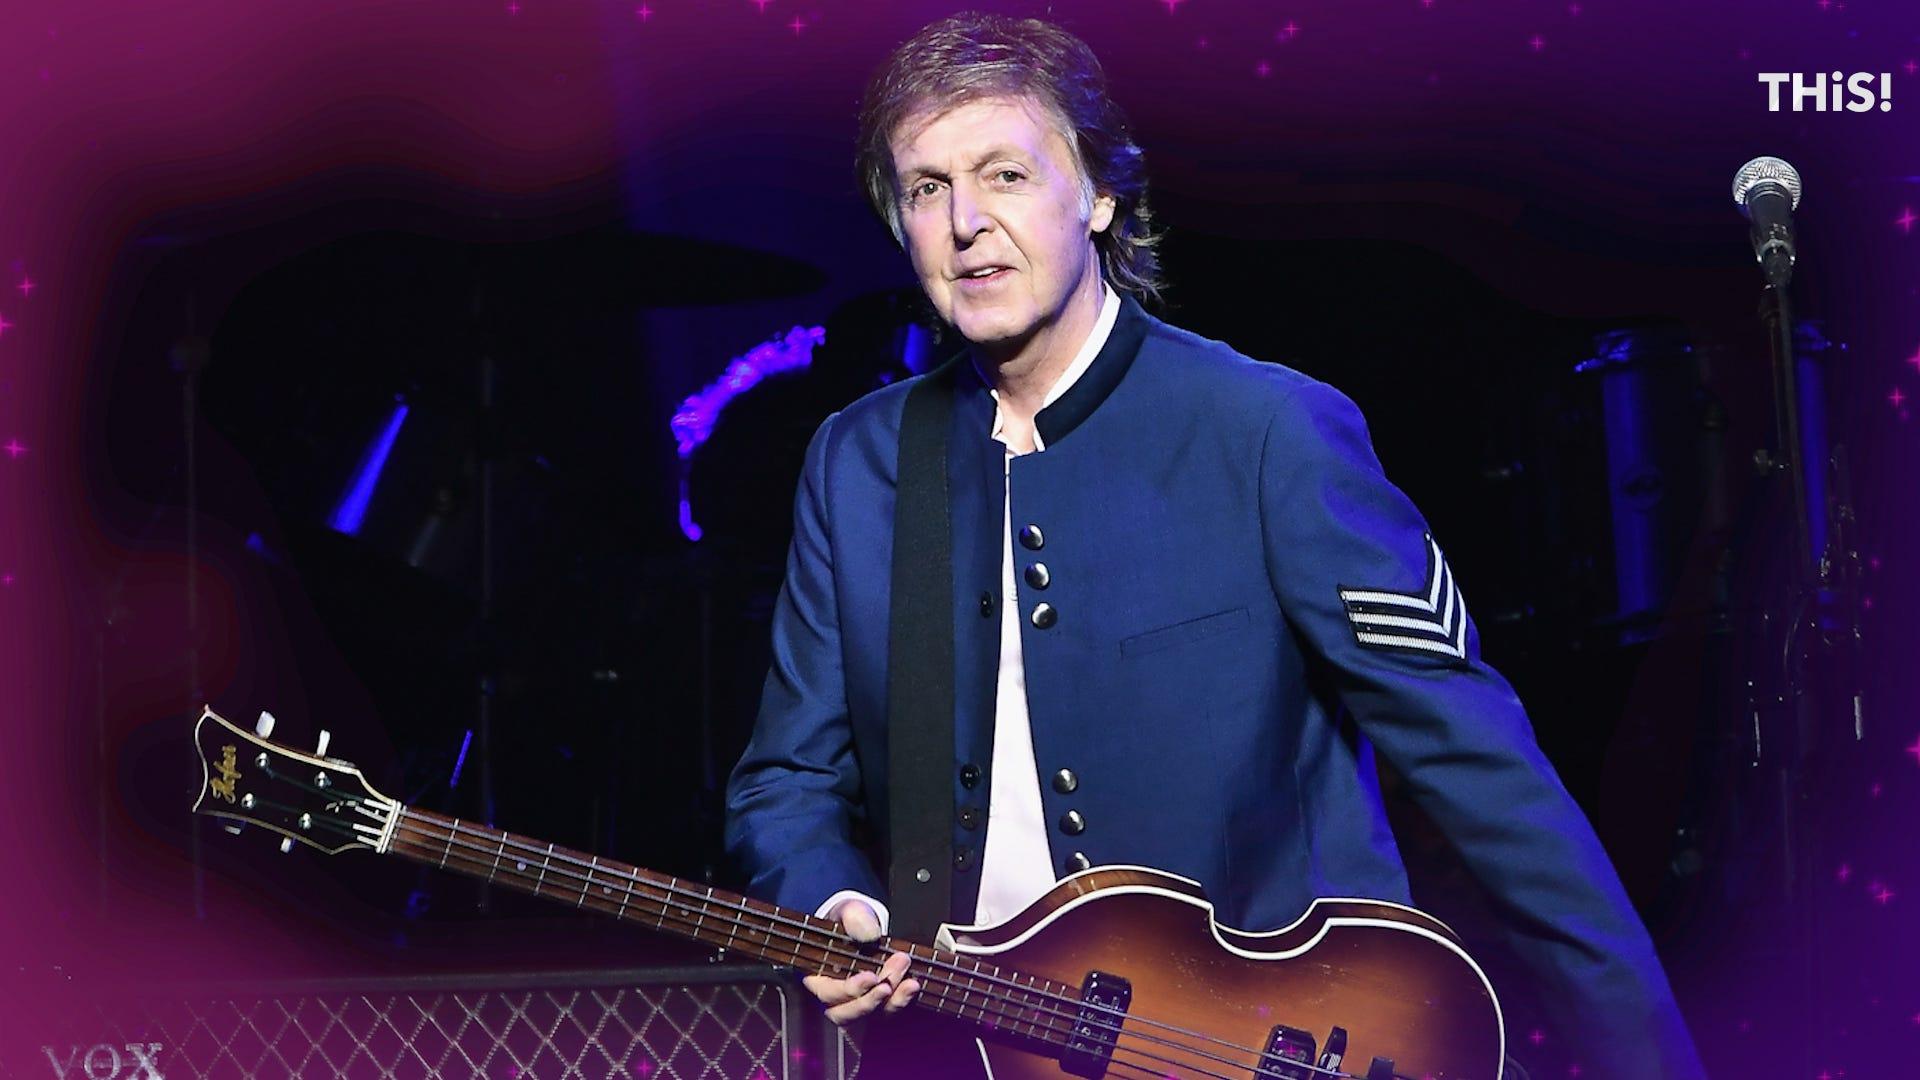 New Paul McCartney, Eric Church, Greta Van Fleet albums highlight New Music Friday